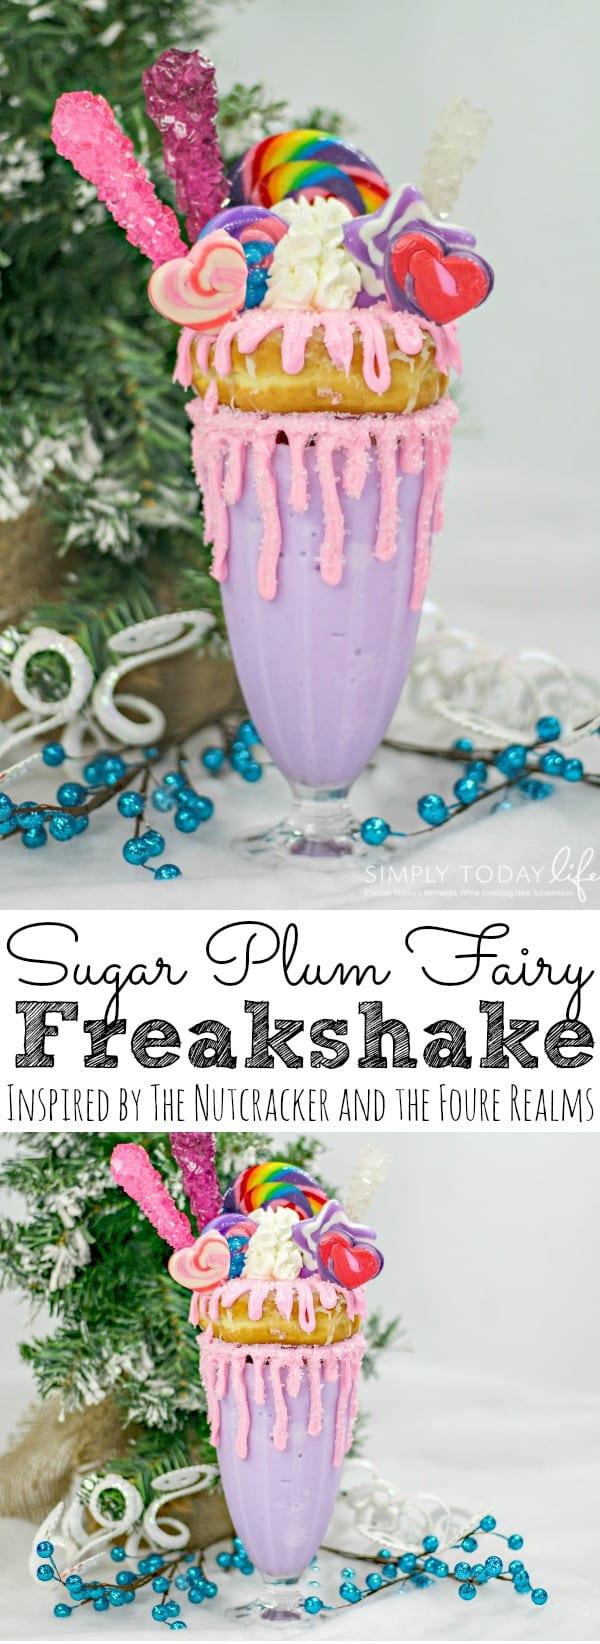 Sugar Plum Fairy Freakshake | The Nutcracker and the Four Realms